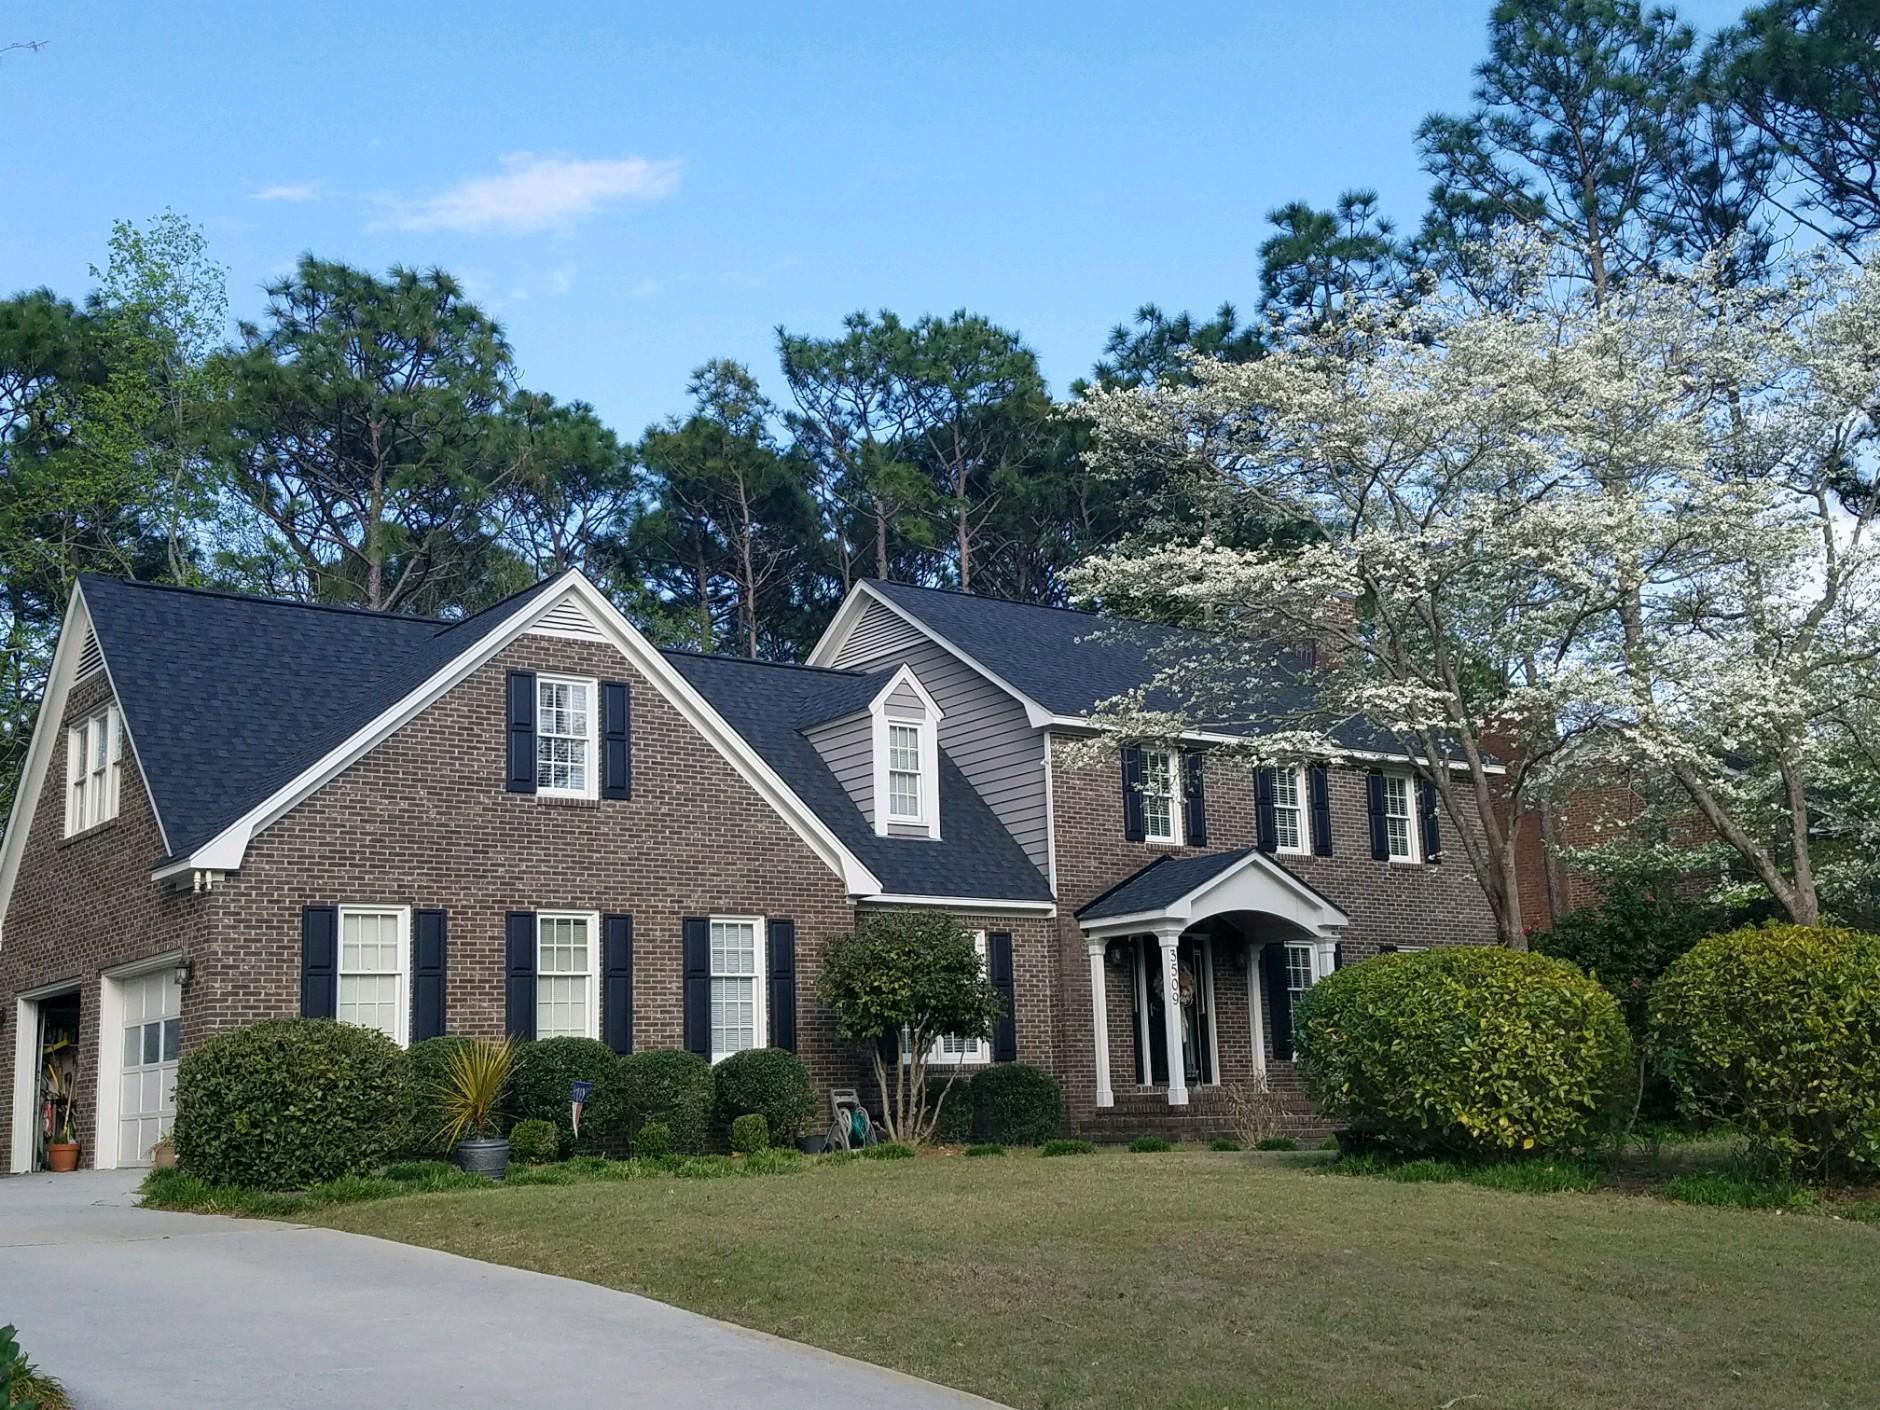 Atlantic Blue Asphalt Shingles Roofing Shingles